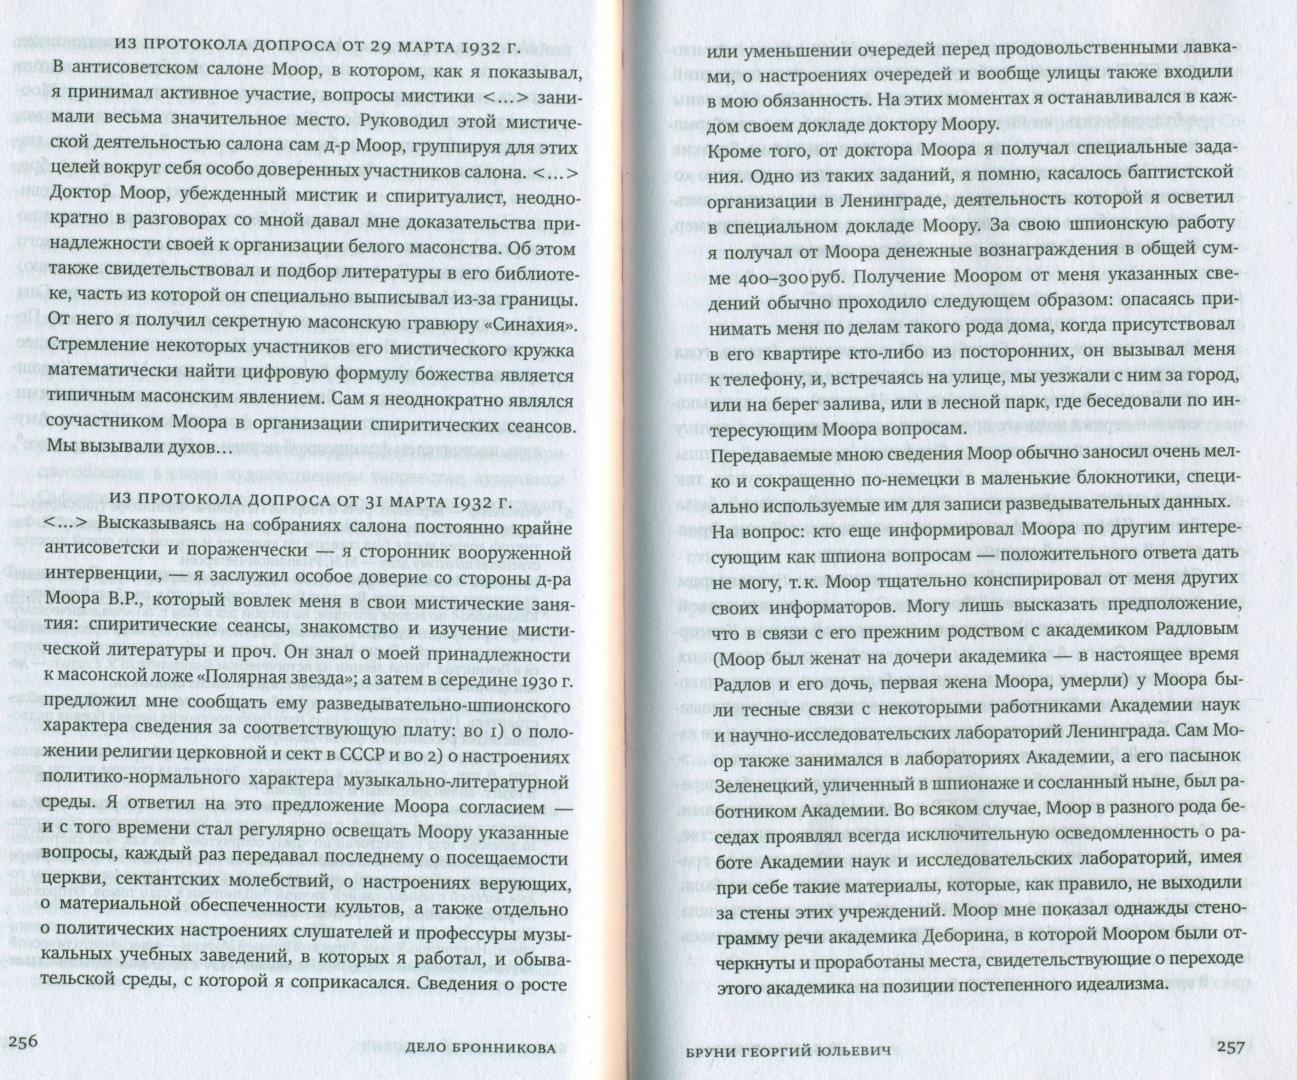 Иллюстрация 23 из 57 для Дело Бронникова - Громова, Позднякова, Вахтина | Лабиринт - книги. Источник: spl